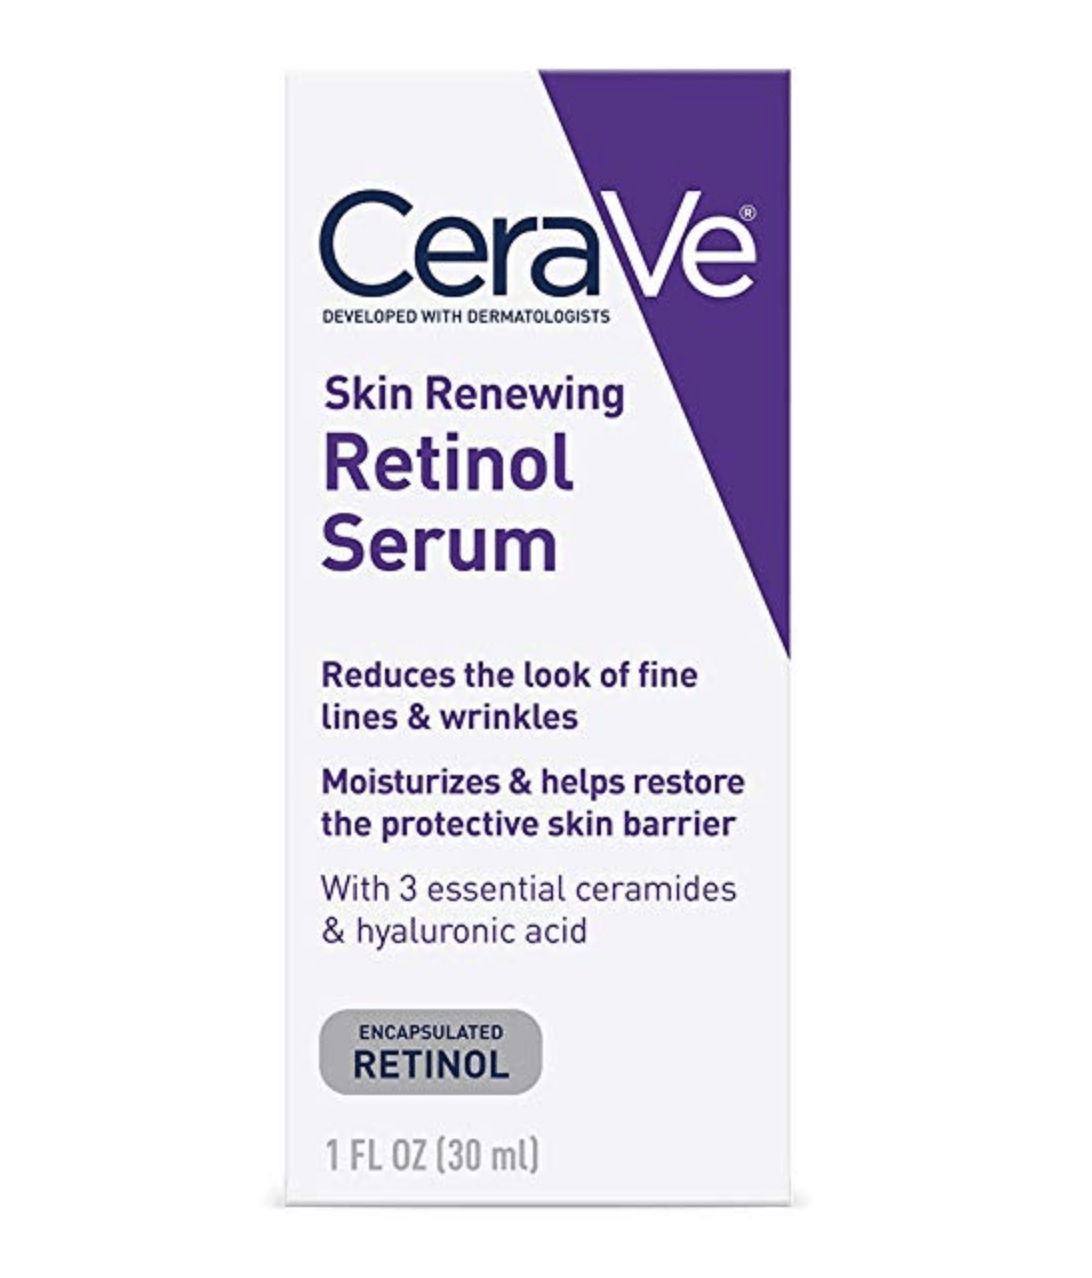 Sérum anti-âge CeraVe